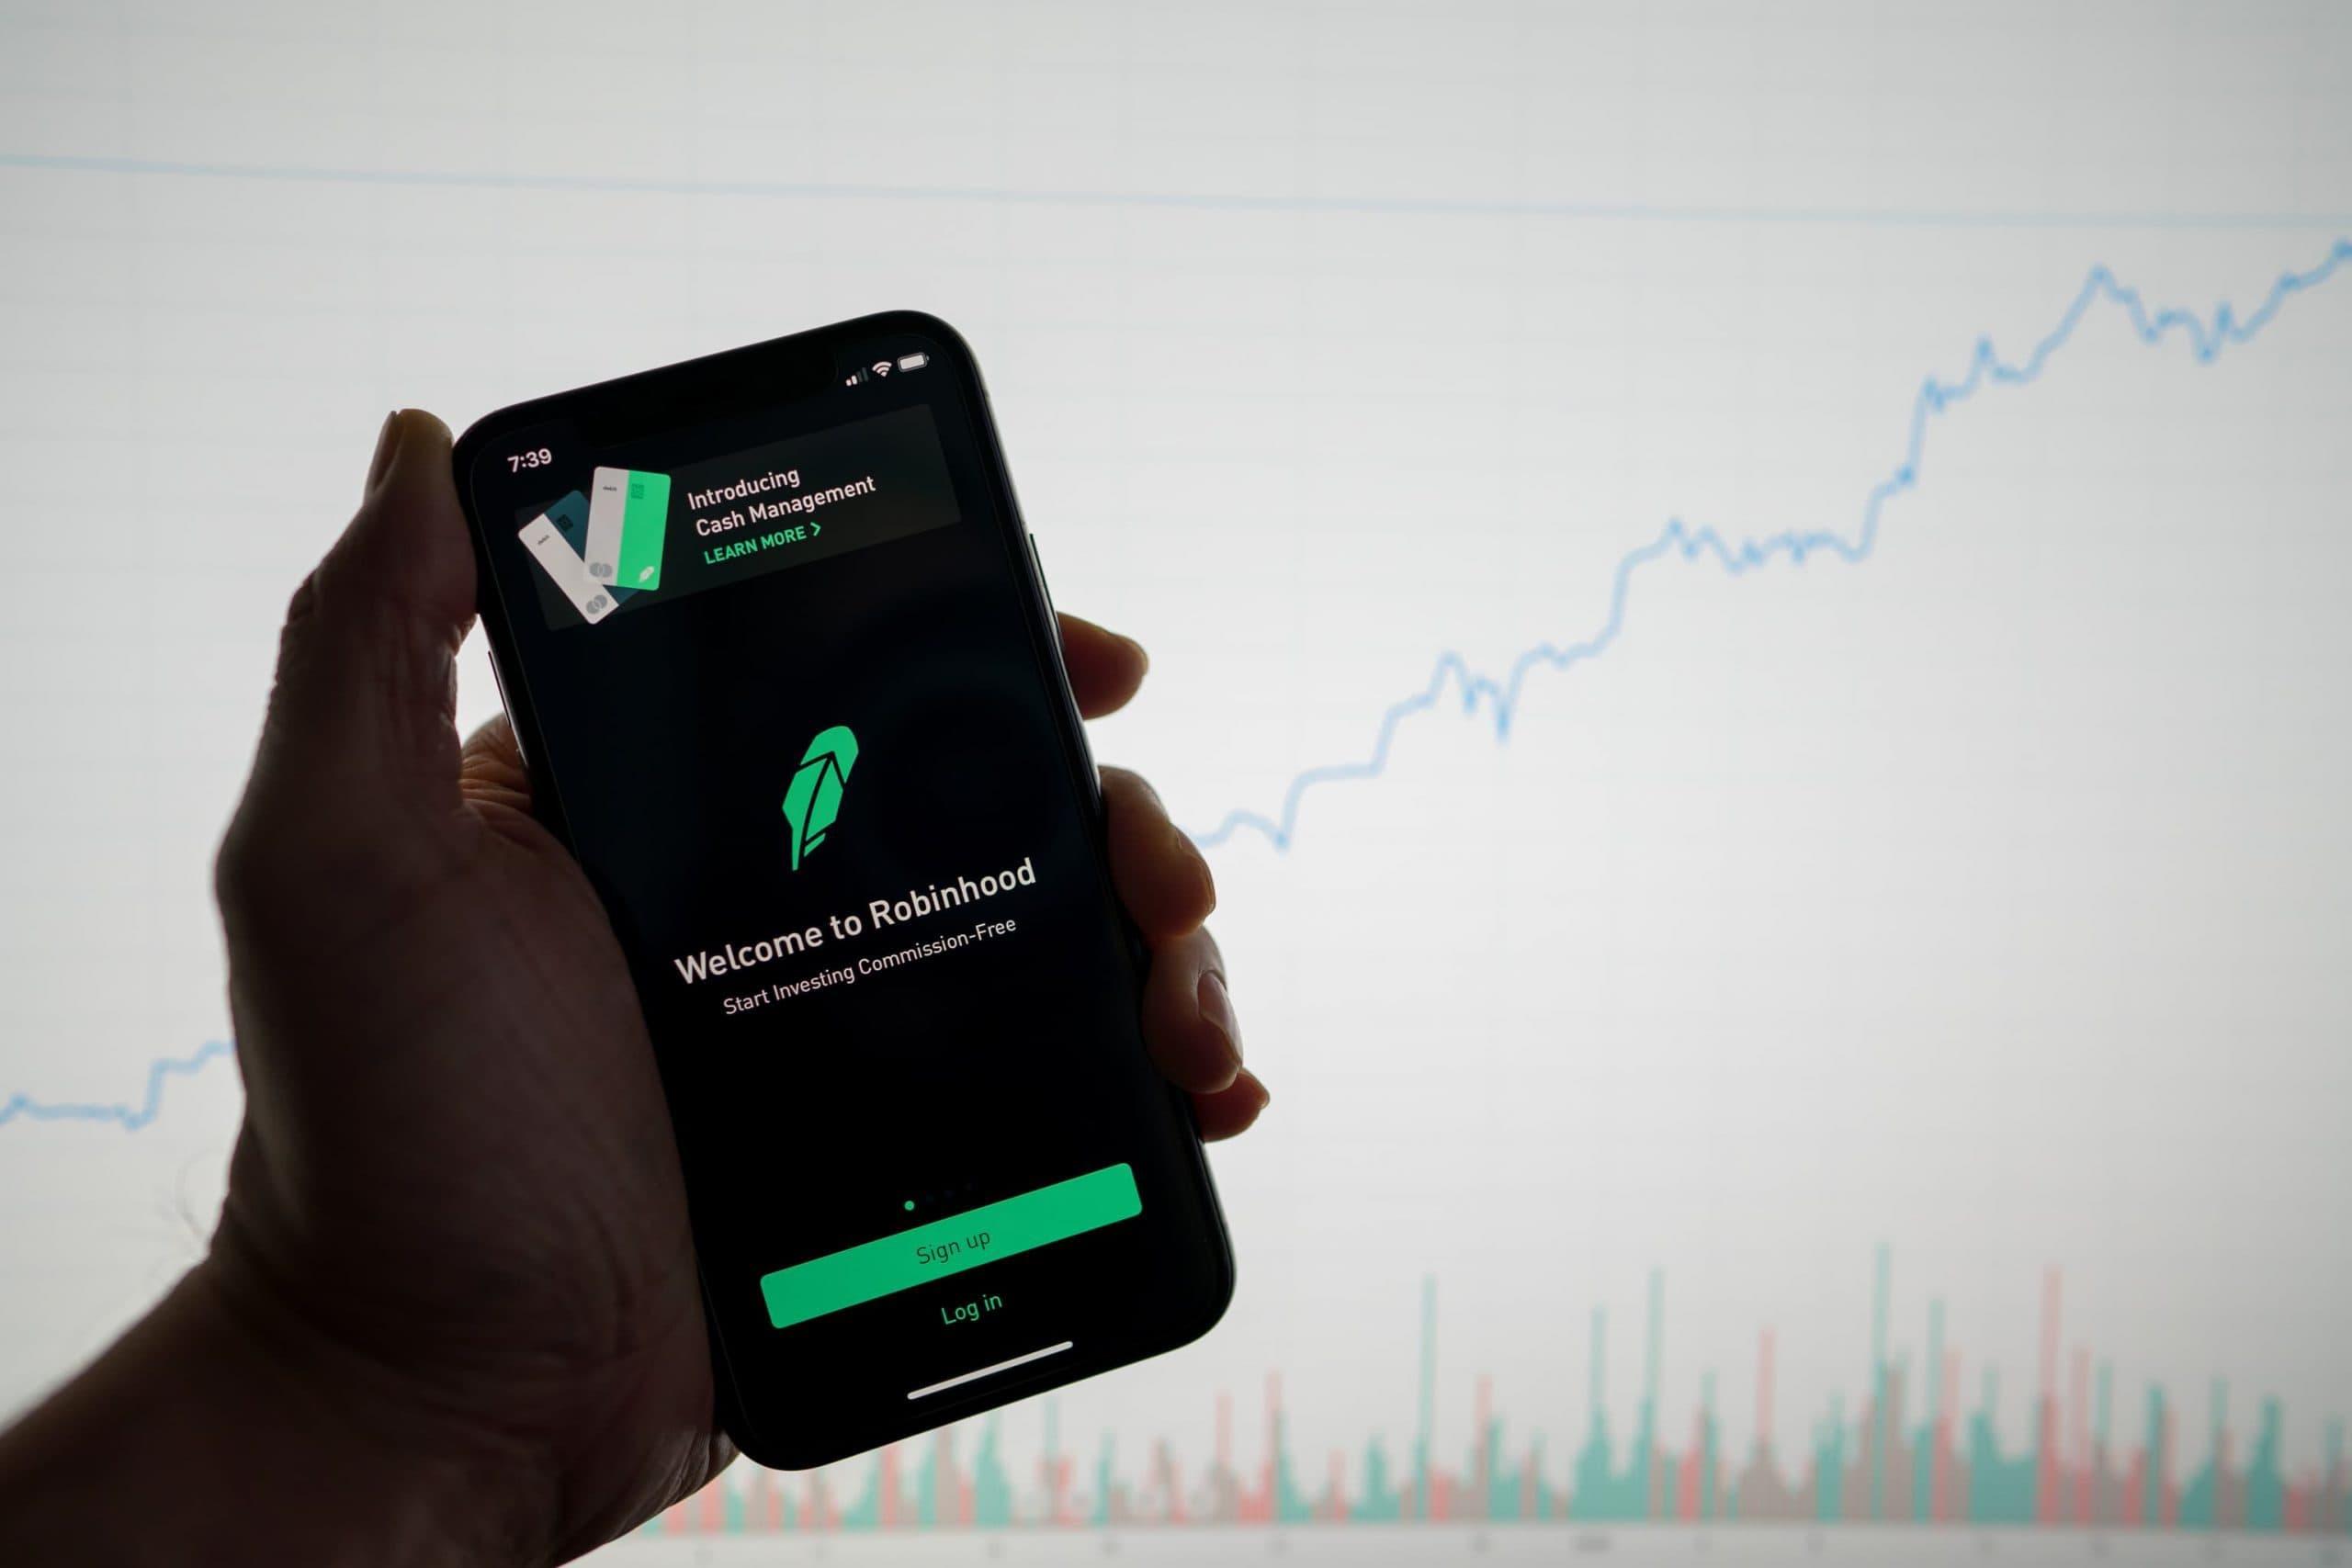 Die Tradig-App Robinhood, dahinter ein Börsen-Chart